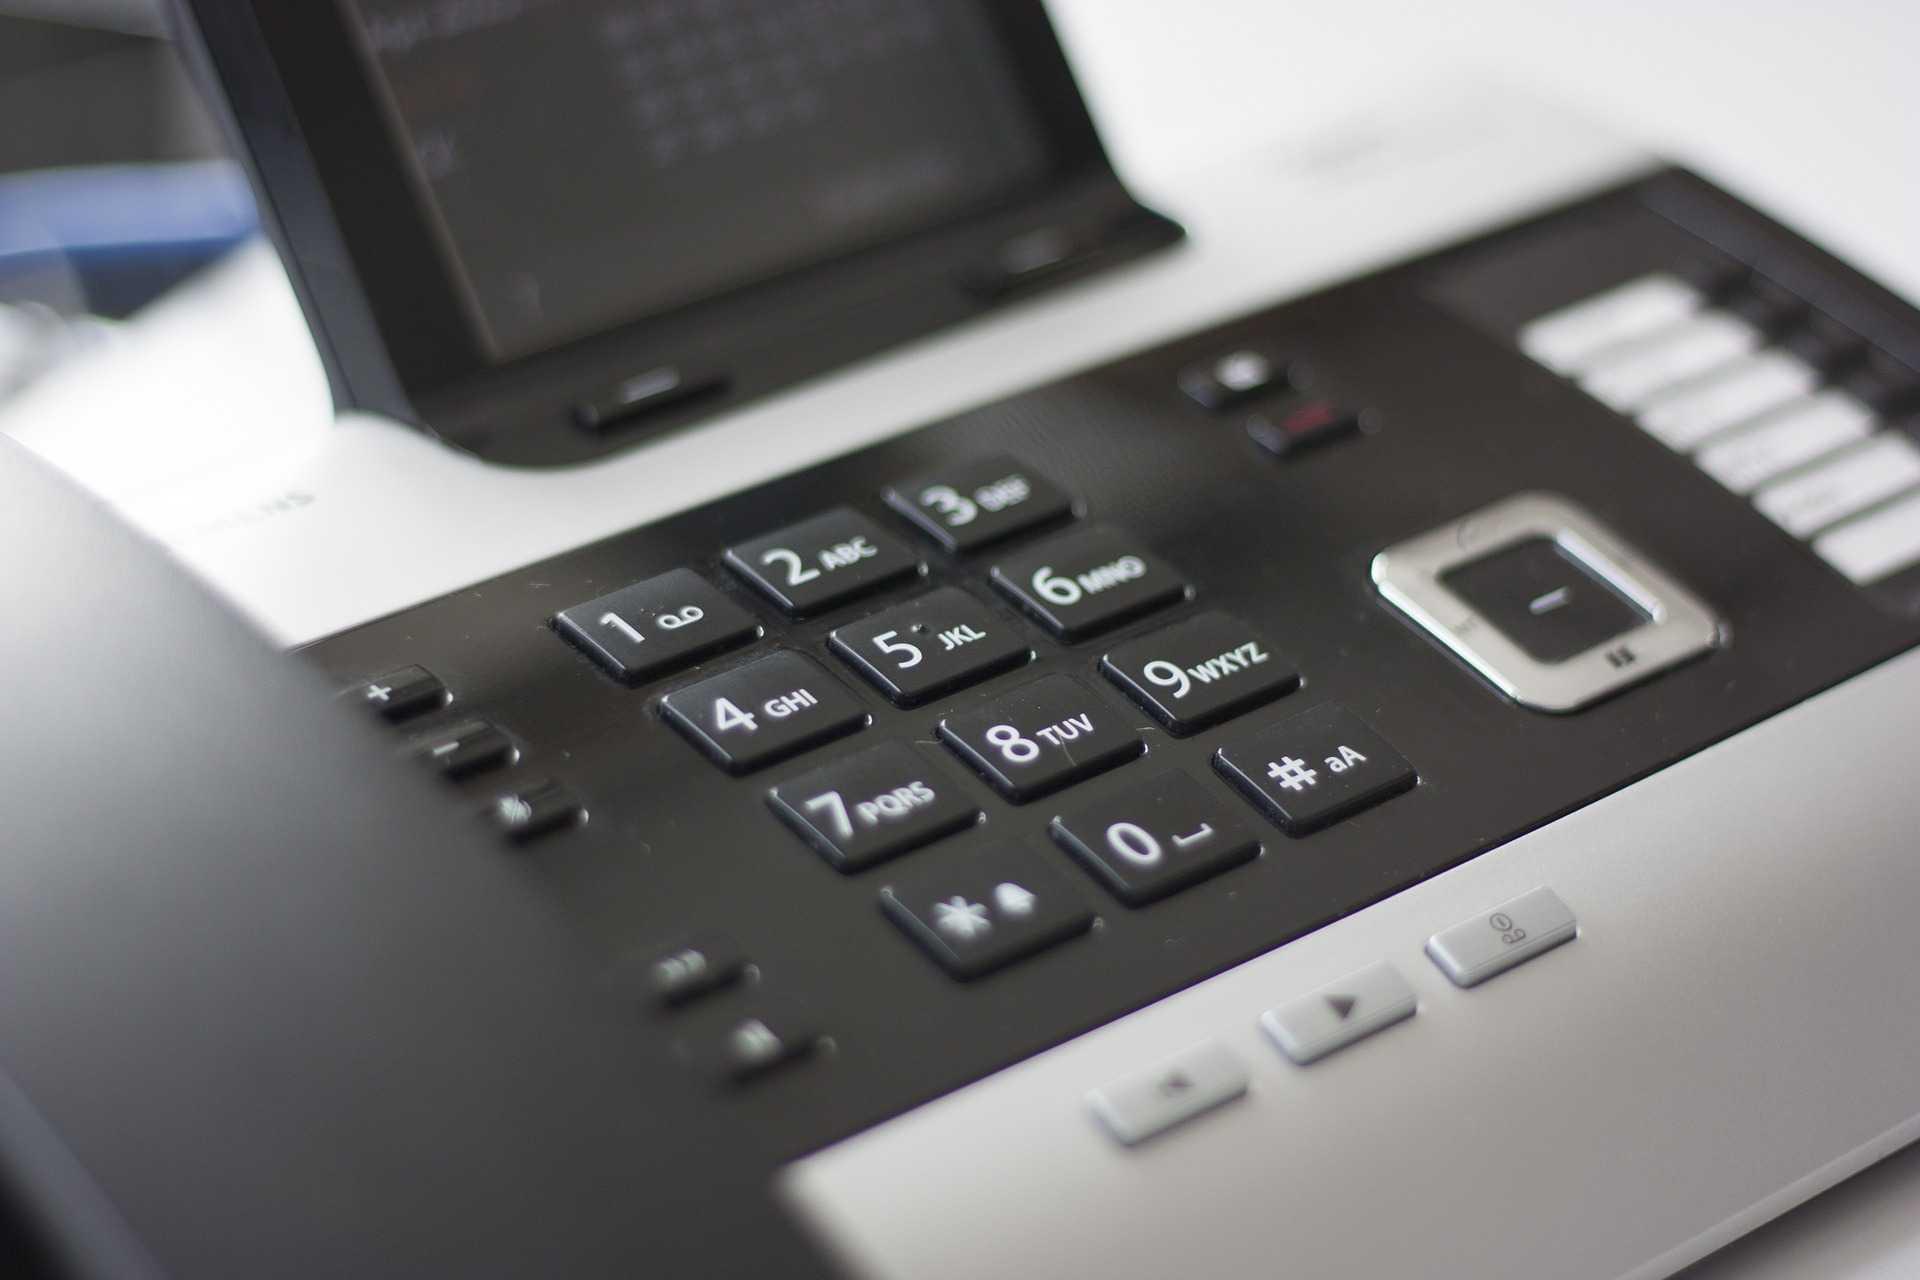 conference call via landline